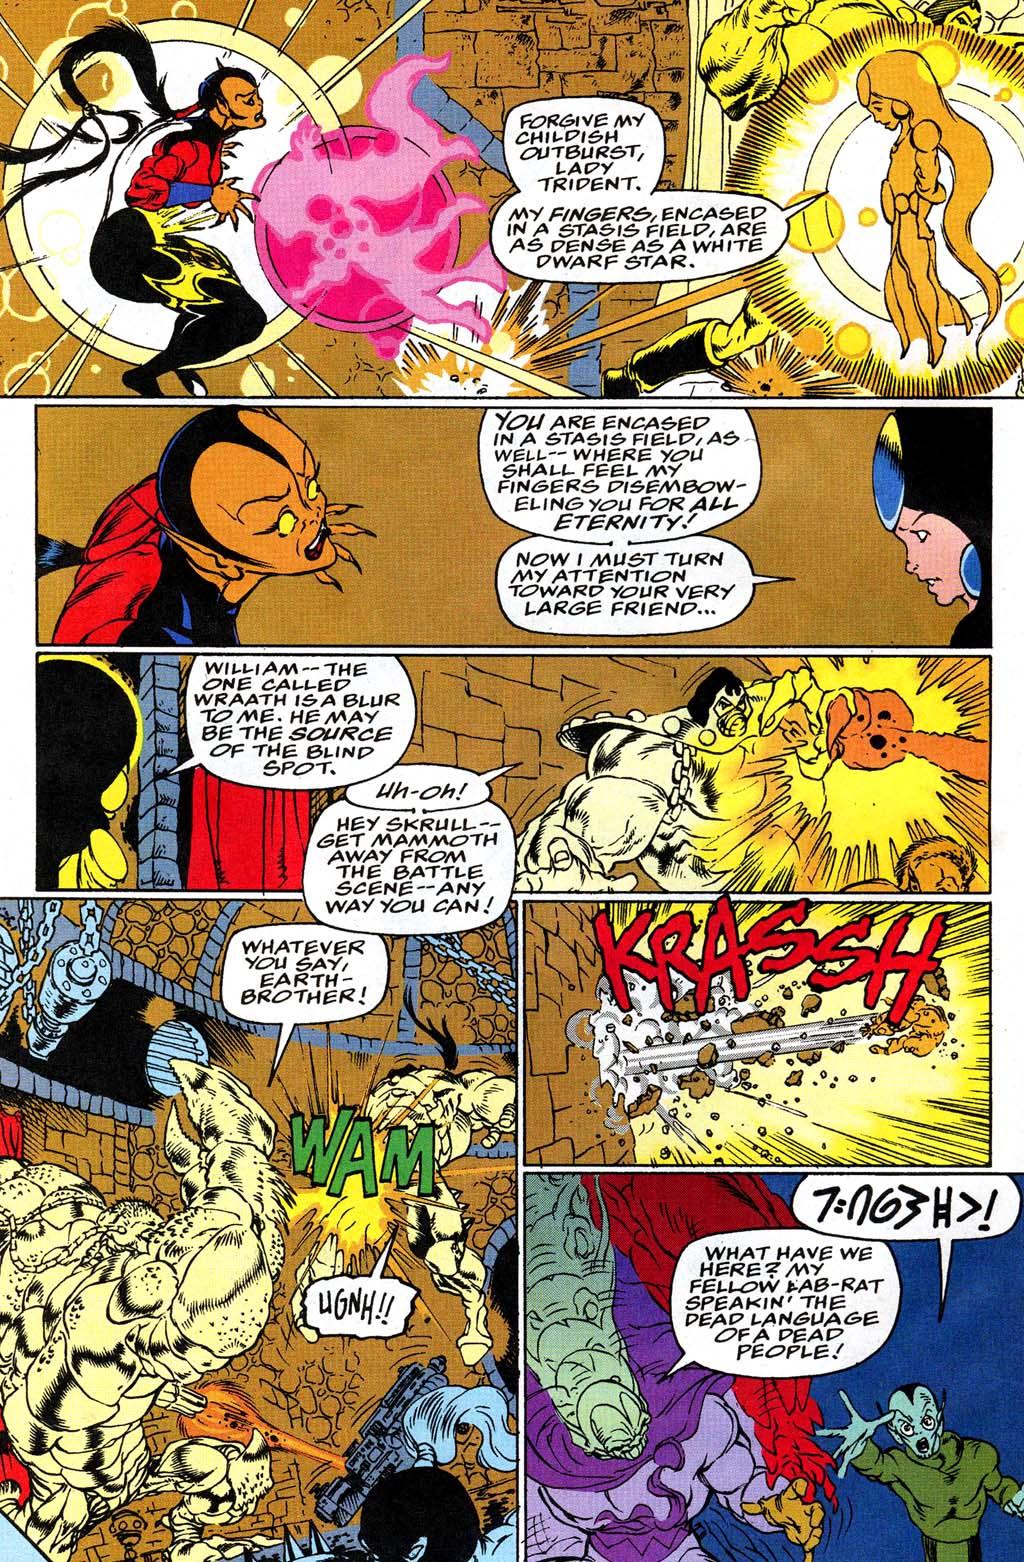 Read online Blackwulf comic -  Issue #10 - 8